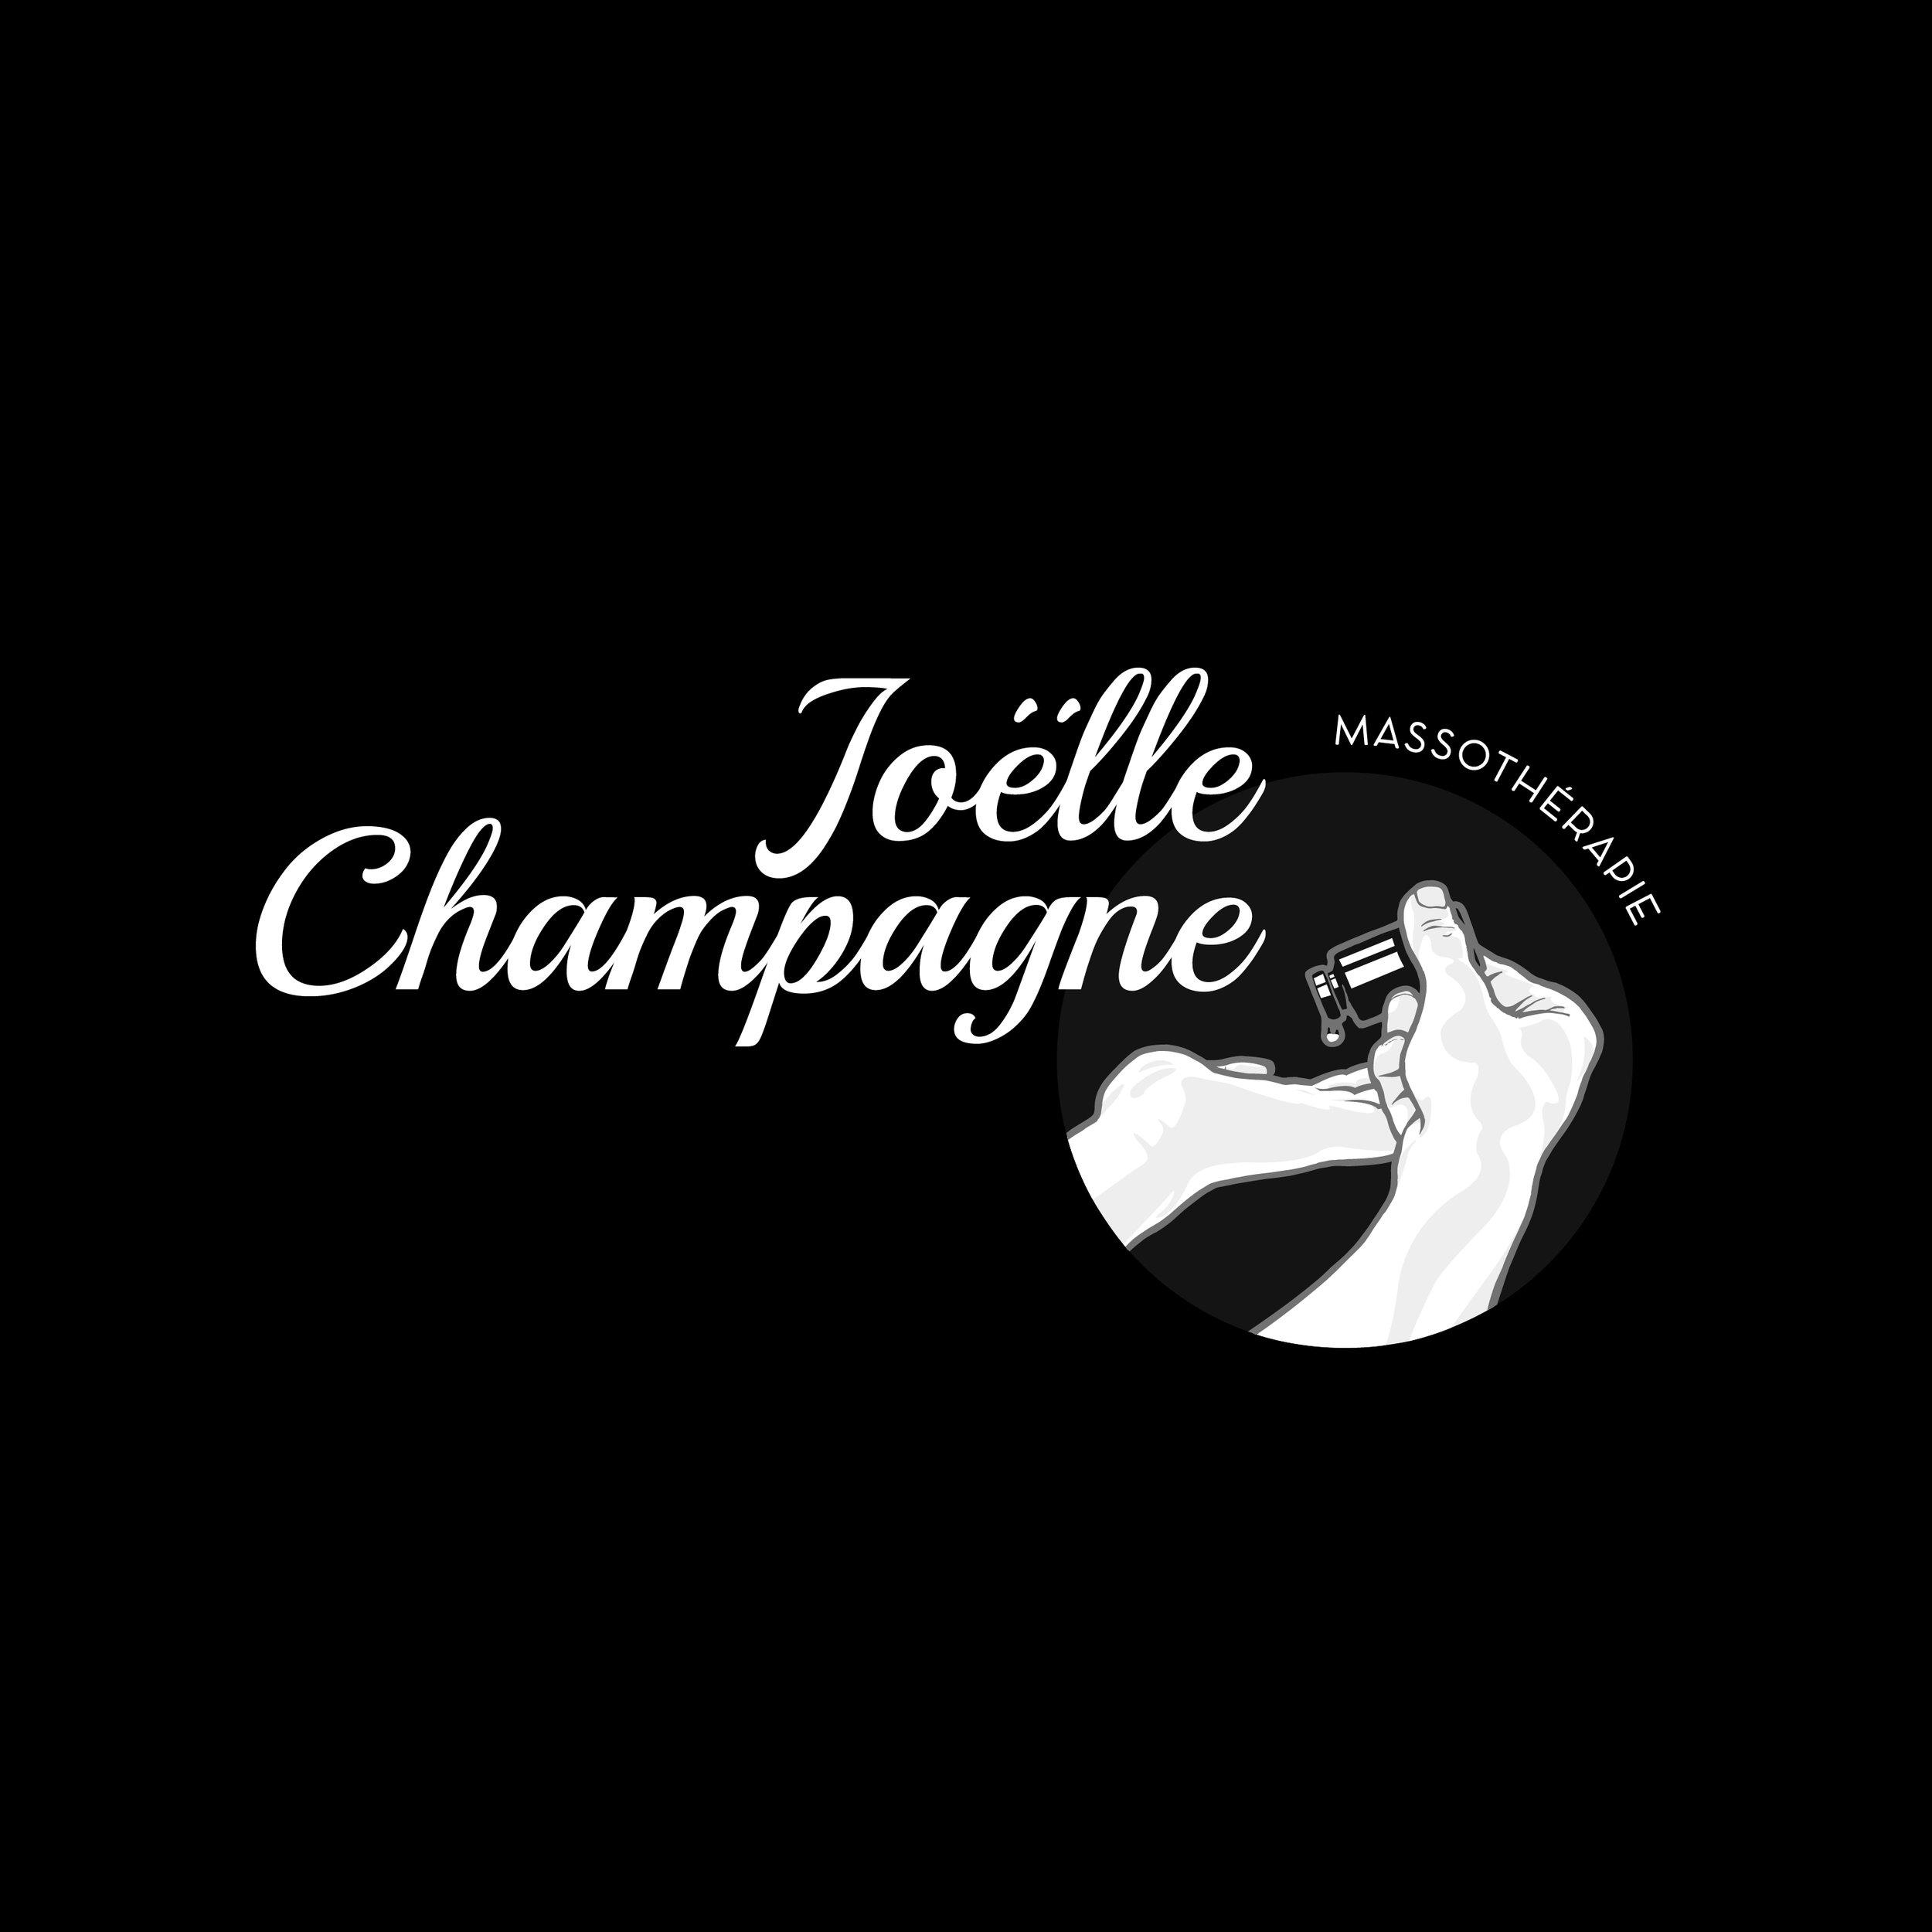 2018-JoelleChampagneMasso-Blanc.jpg